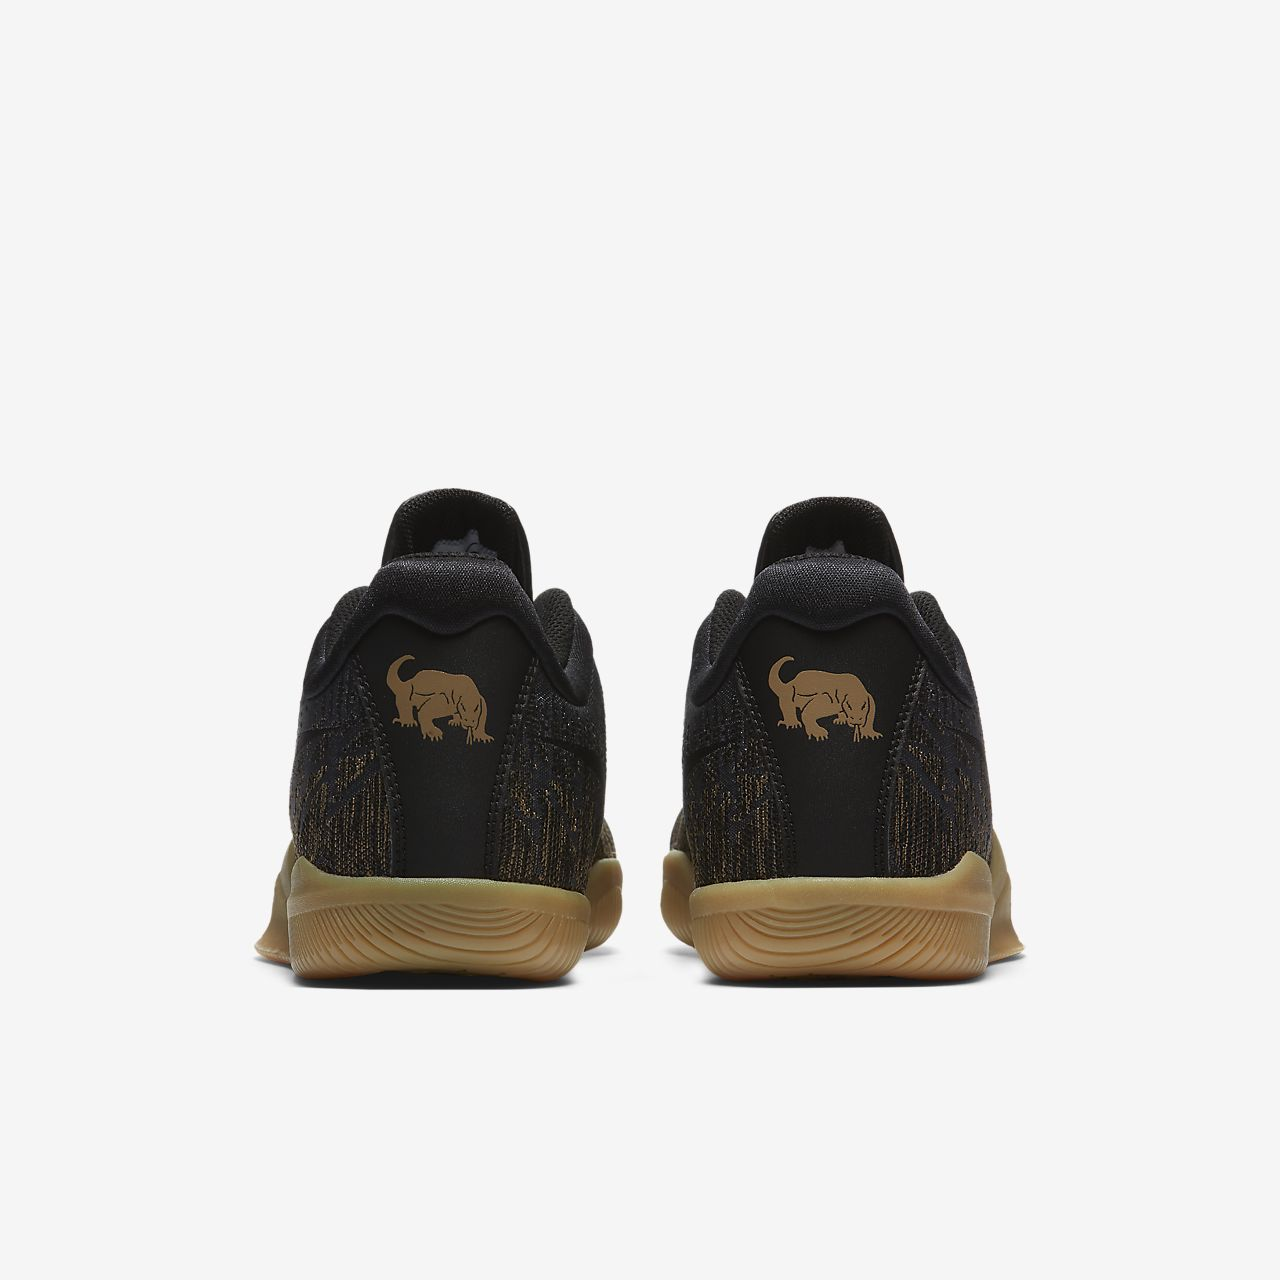 19da1cca5043 get nike kobe mamba rage premium basketball shoe nk aj7281 006 a9d60 ...